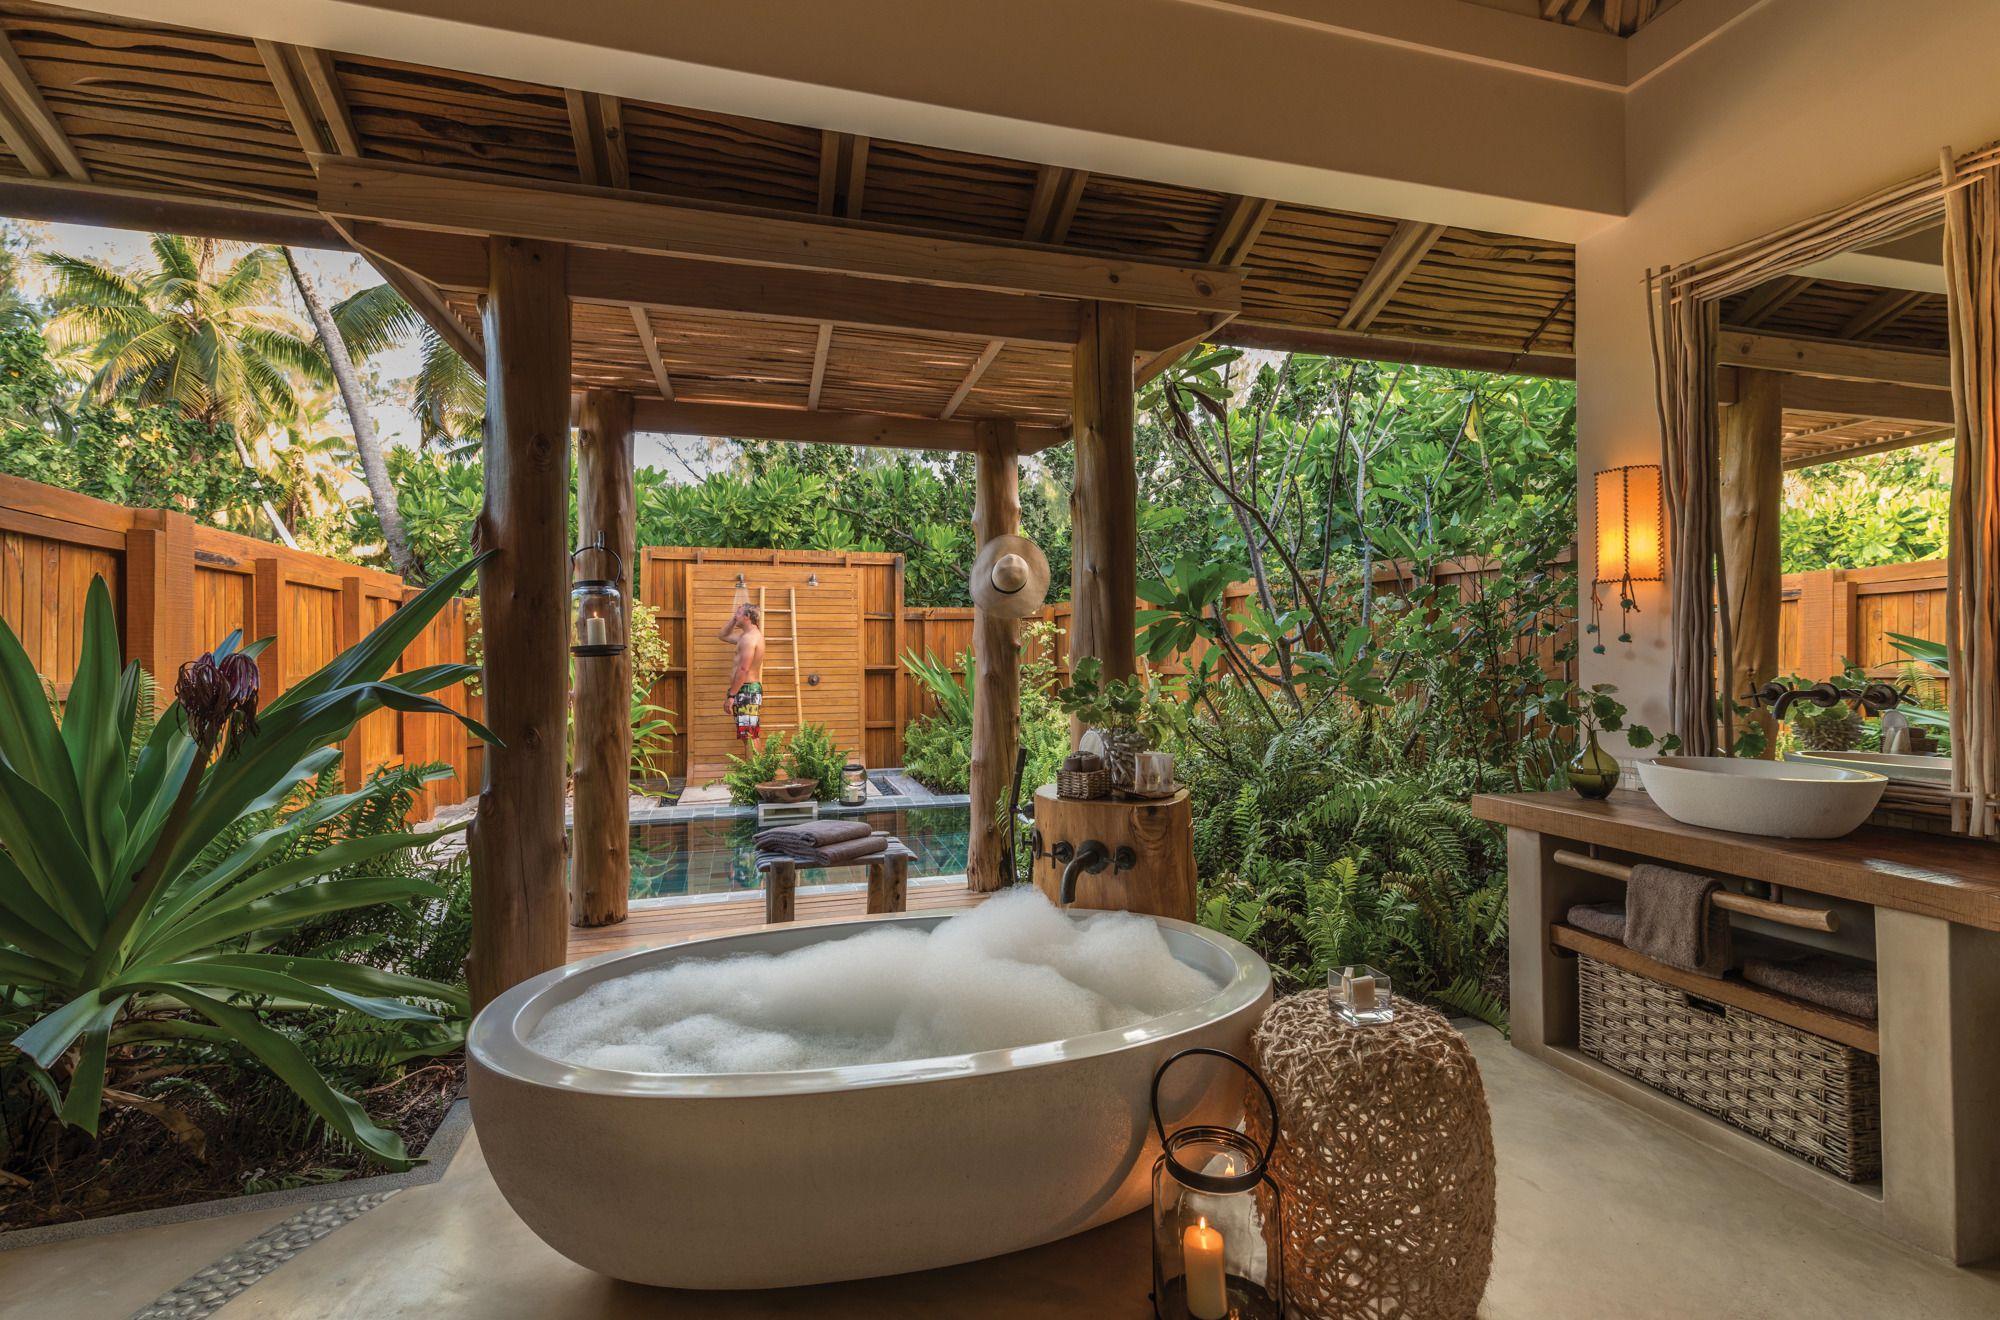 Lovely outdoor bathroom ideas stone bathtub wooden bench wooden